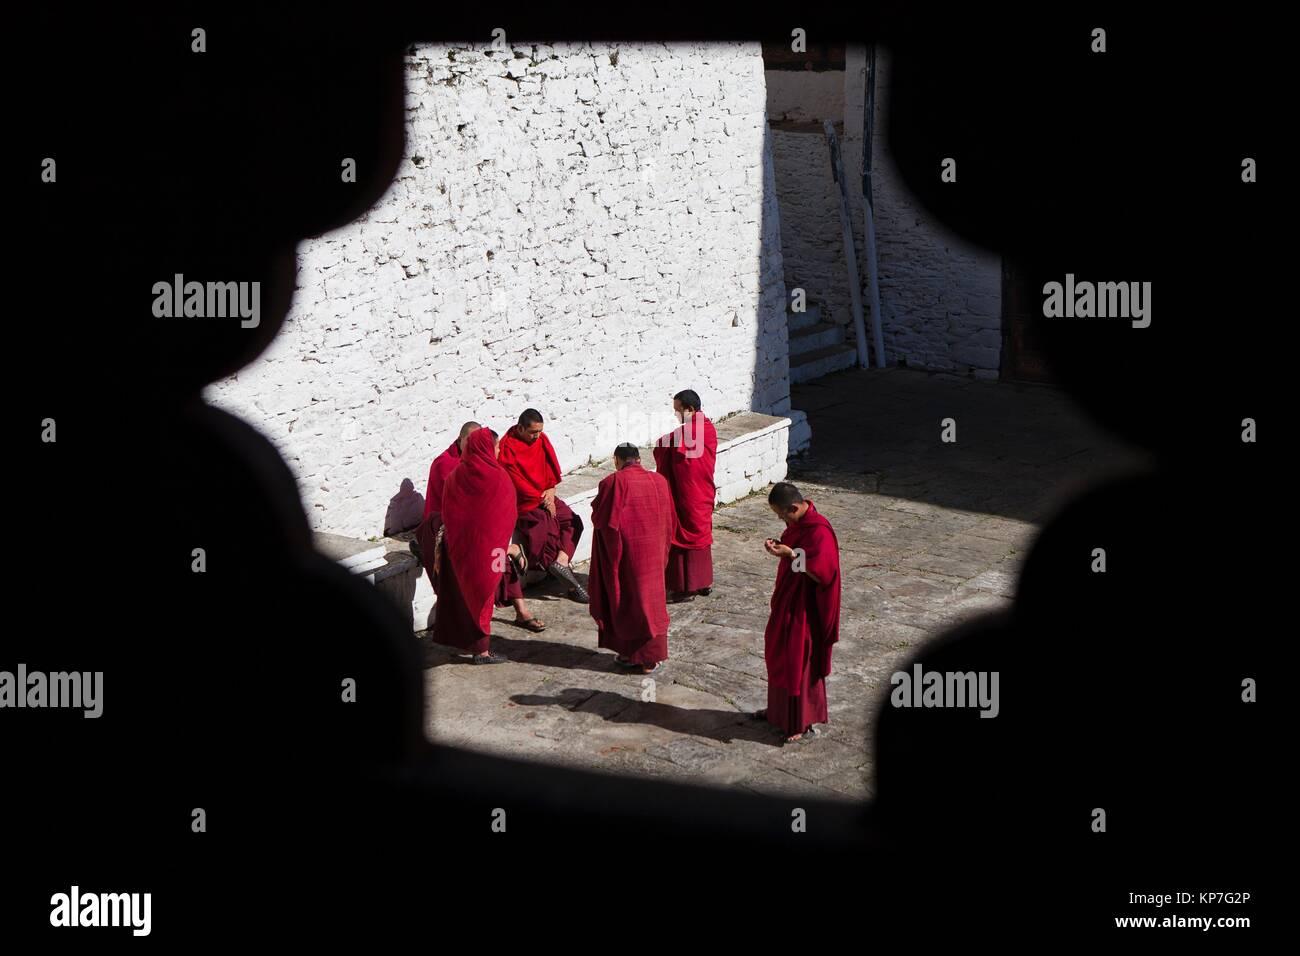 A group of monks in the patio of Trongsa Dzong, Trongsa, Bhutan, Asia - Stock Image